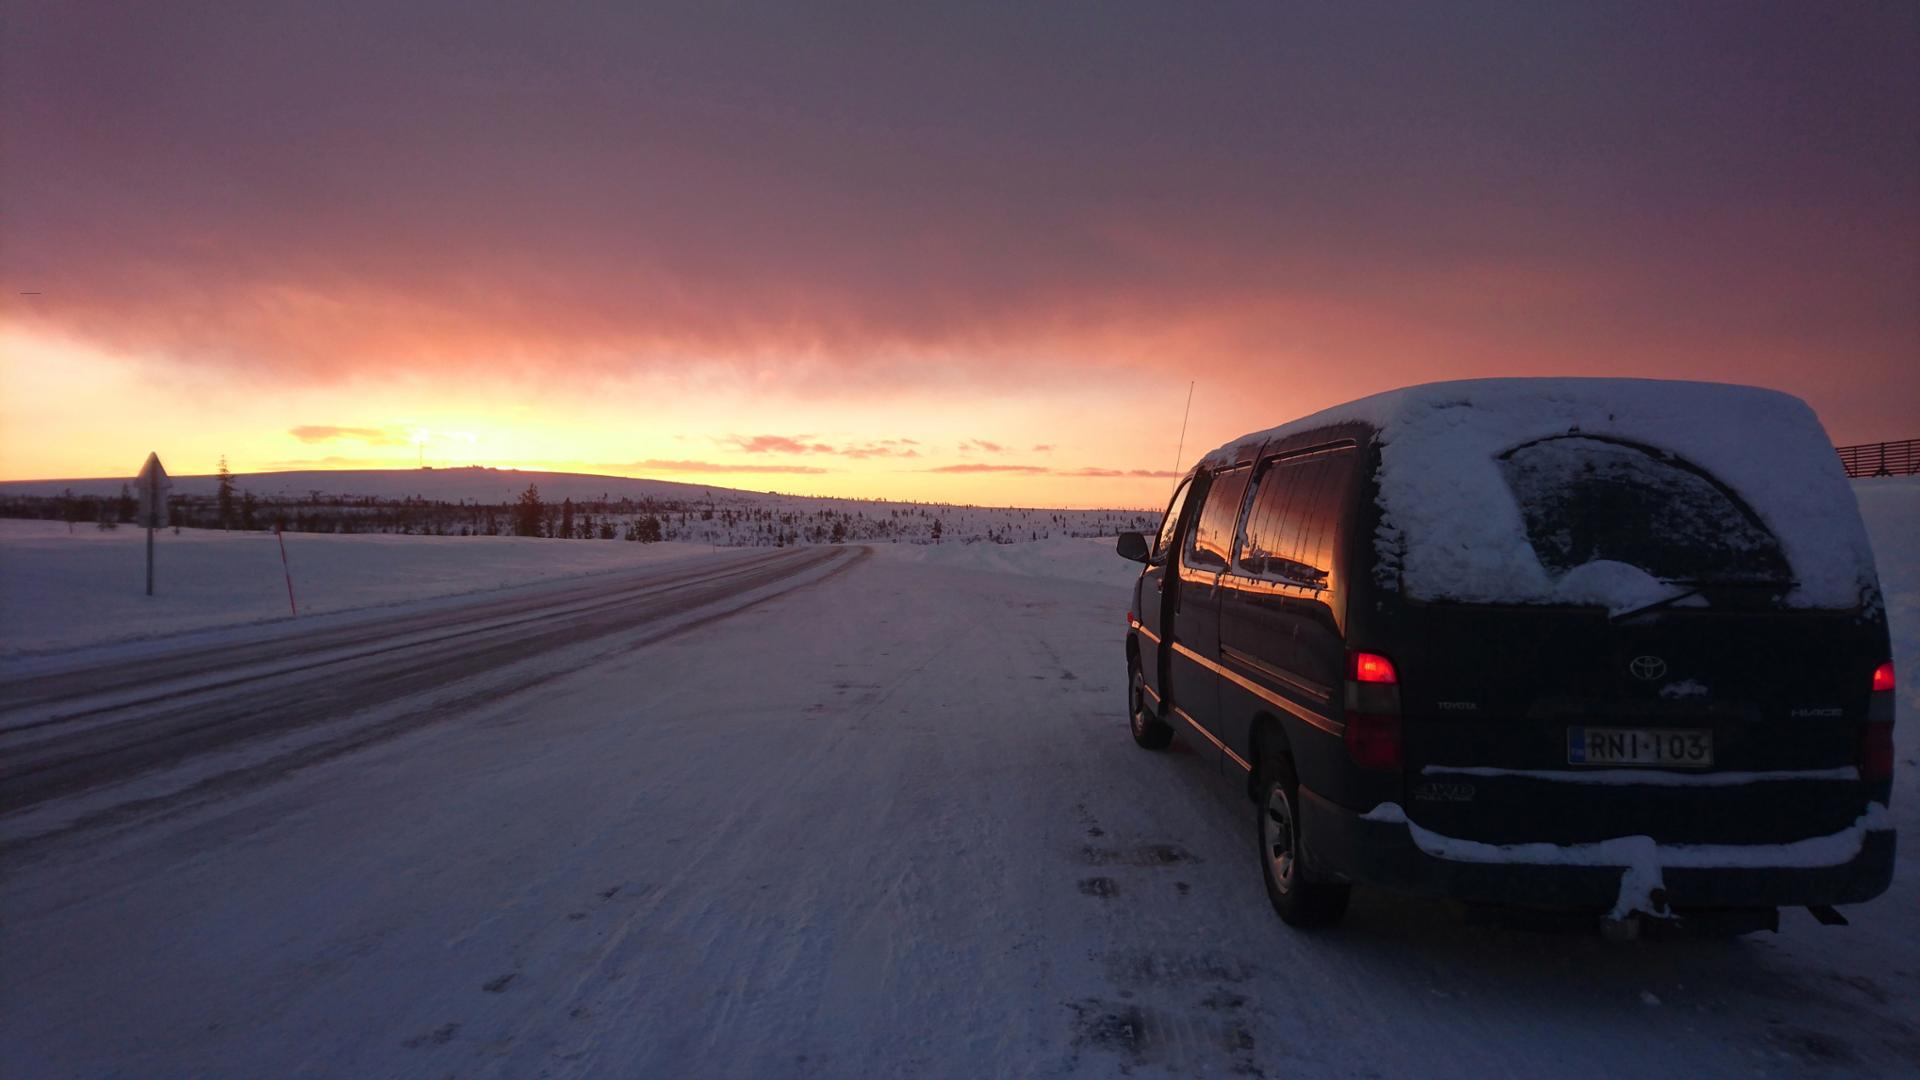 Roadtrip in Finnish Lapland..